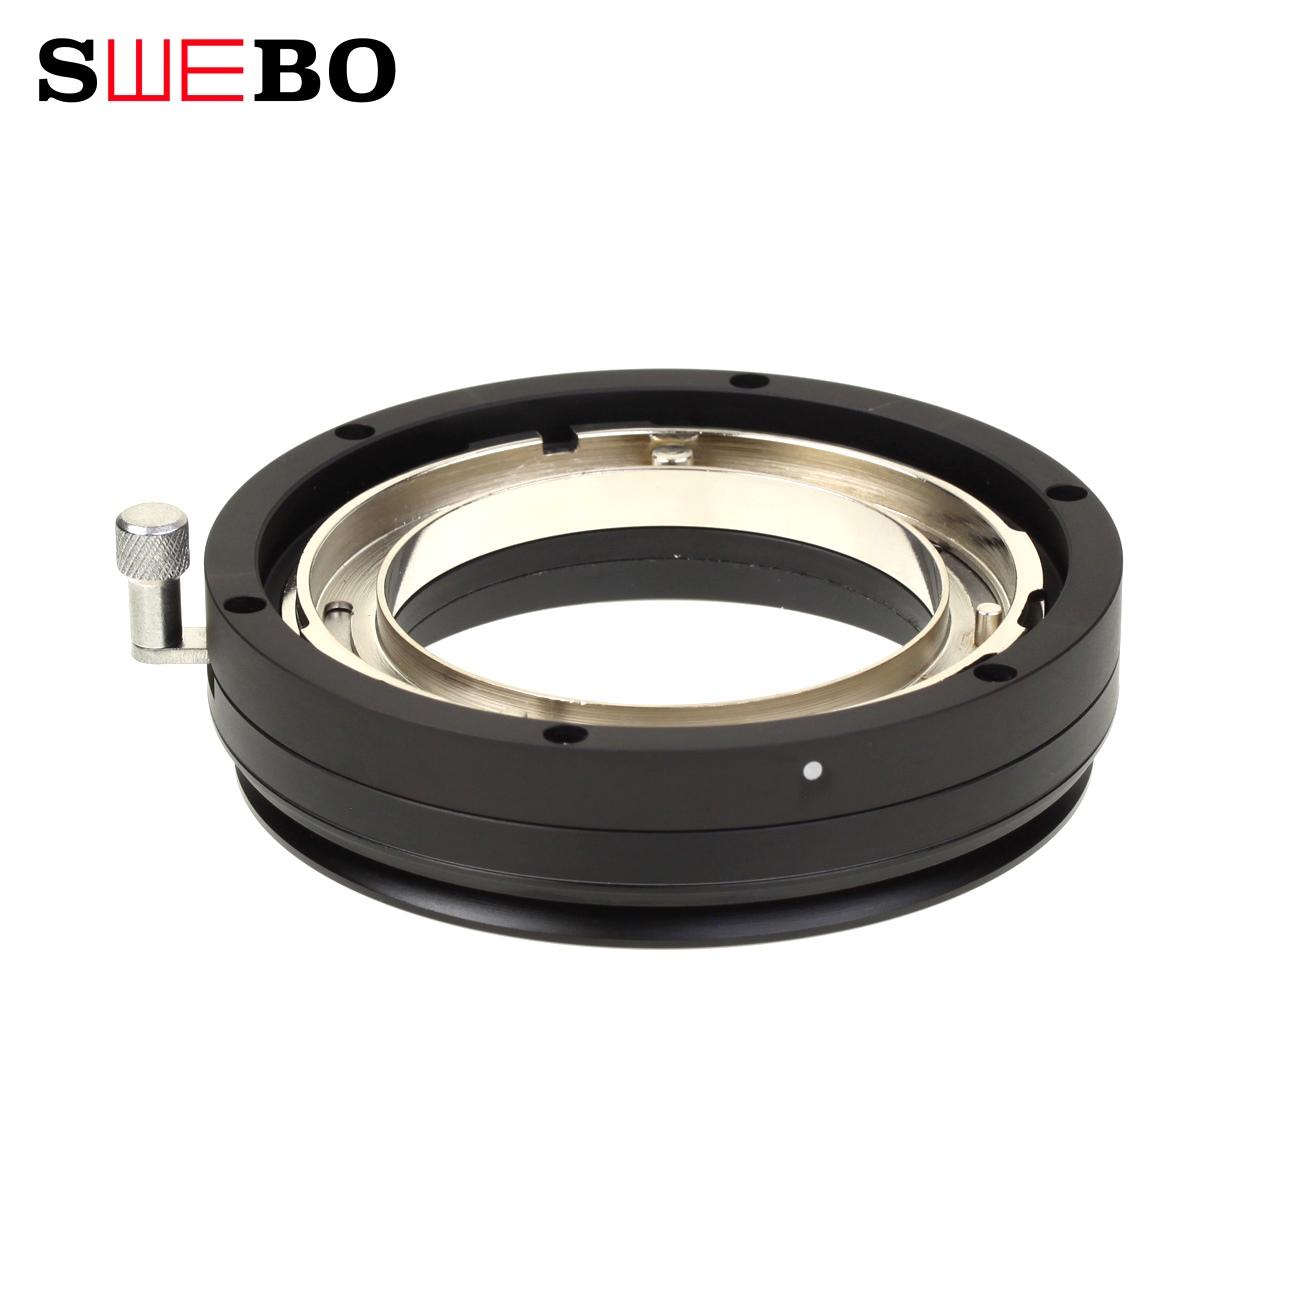 SWEBO微单轨镜头板玛米亚RB67口 适合玛米亚RB67 RZ67镜头